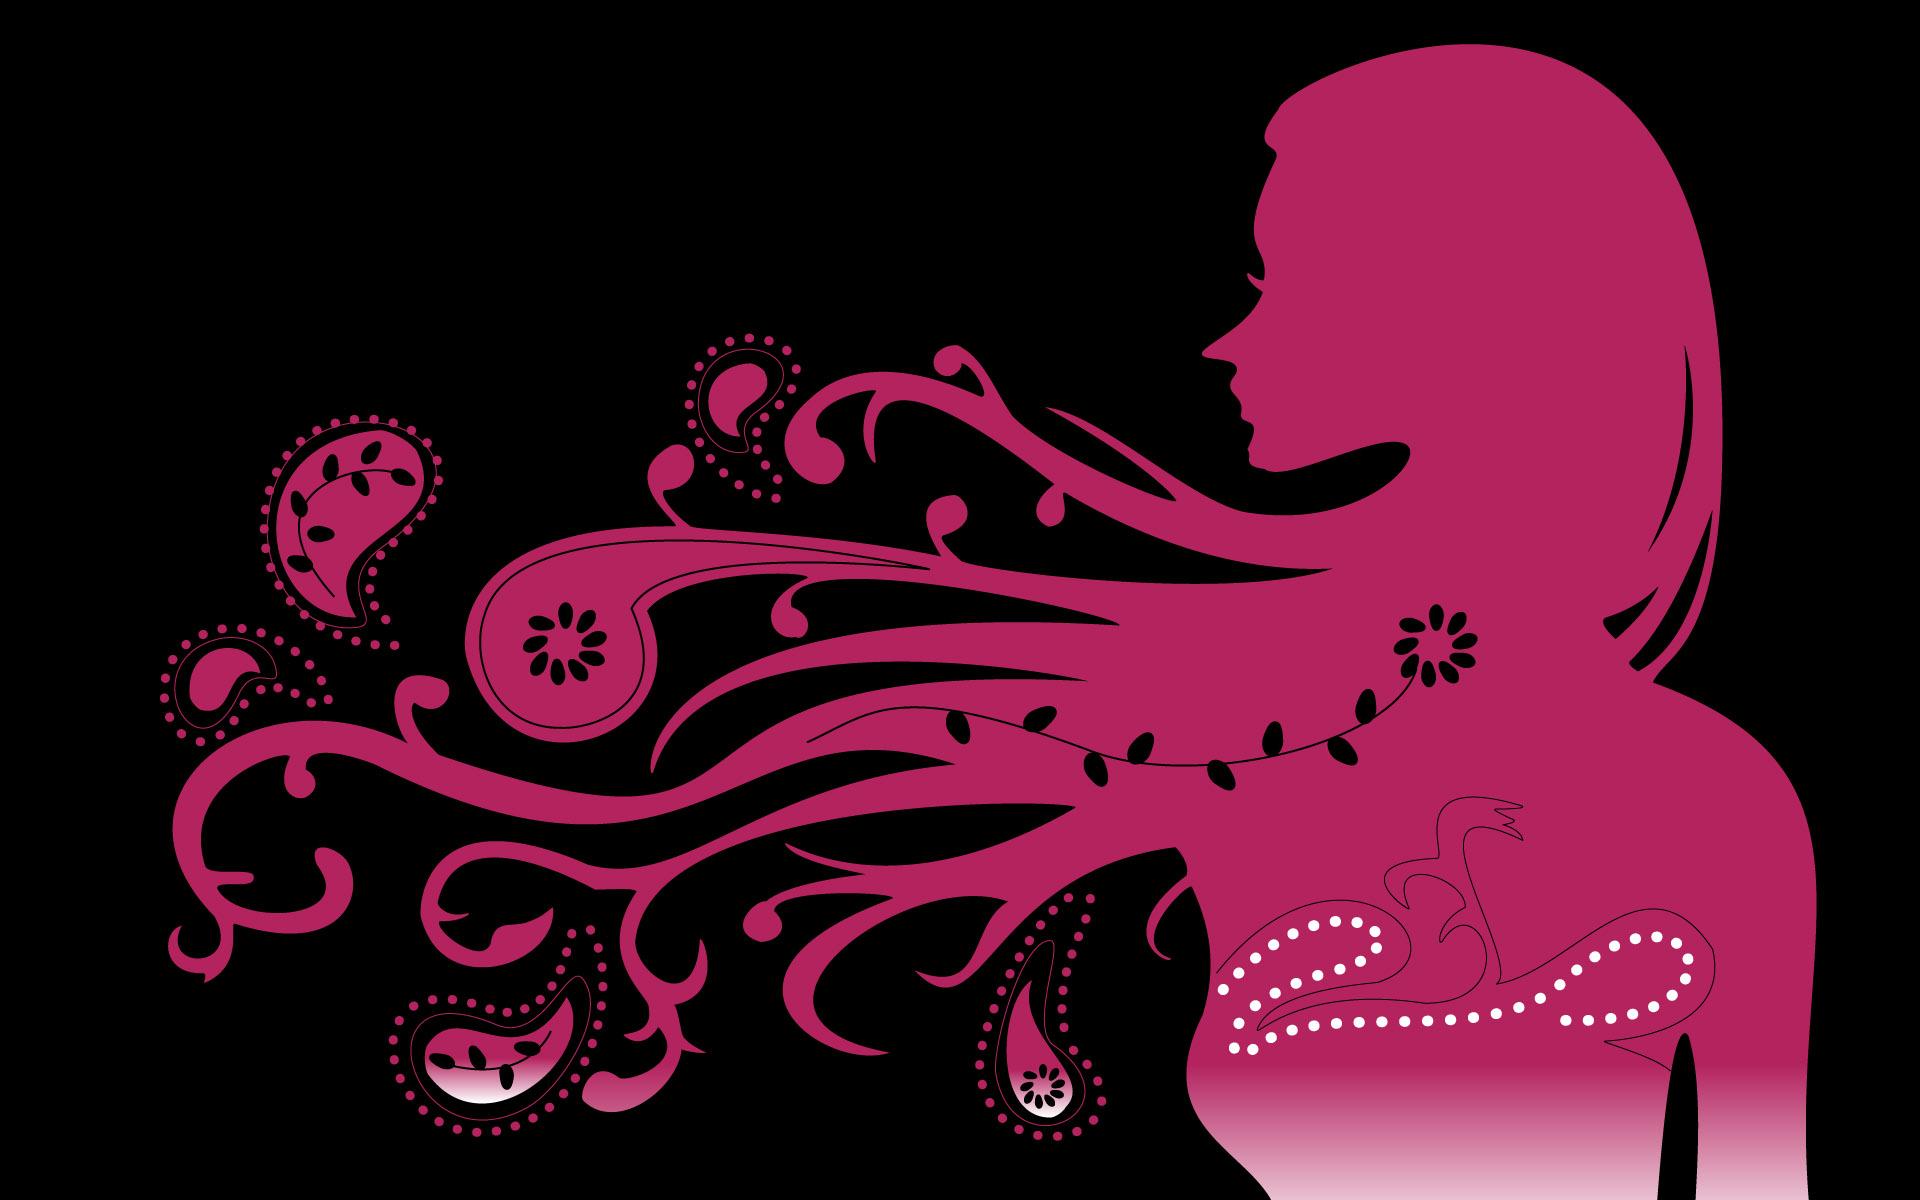 Pink Hd Abstract To Paisley Myspace Backgroun High 256574 Wallpaper wallpaper